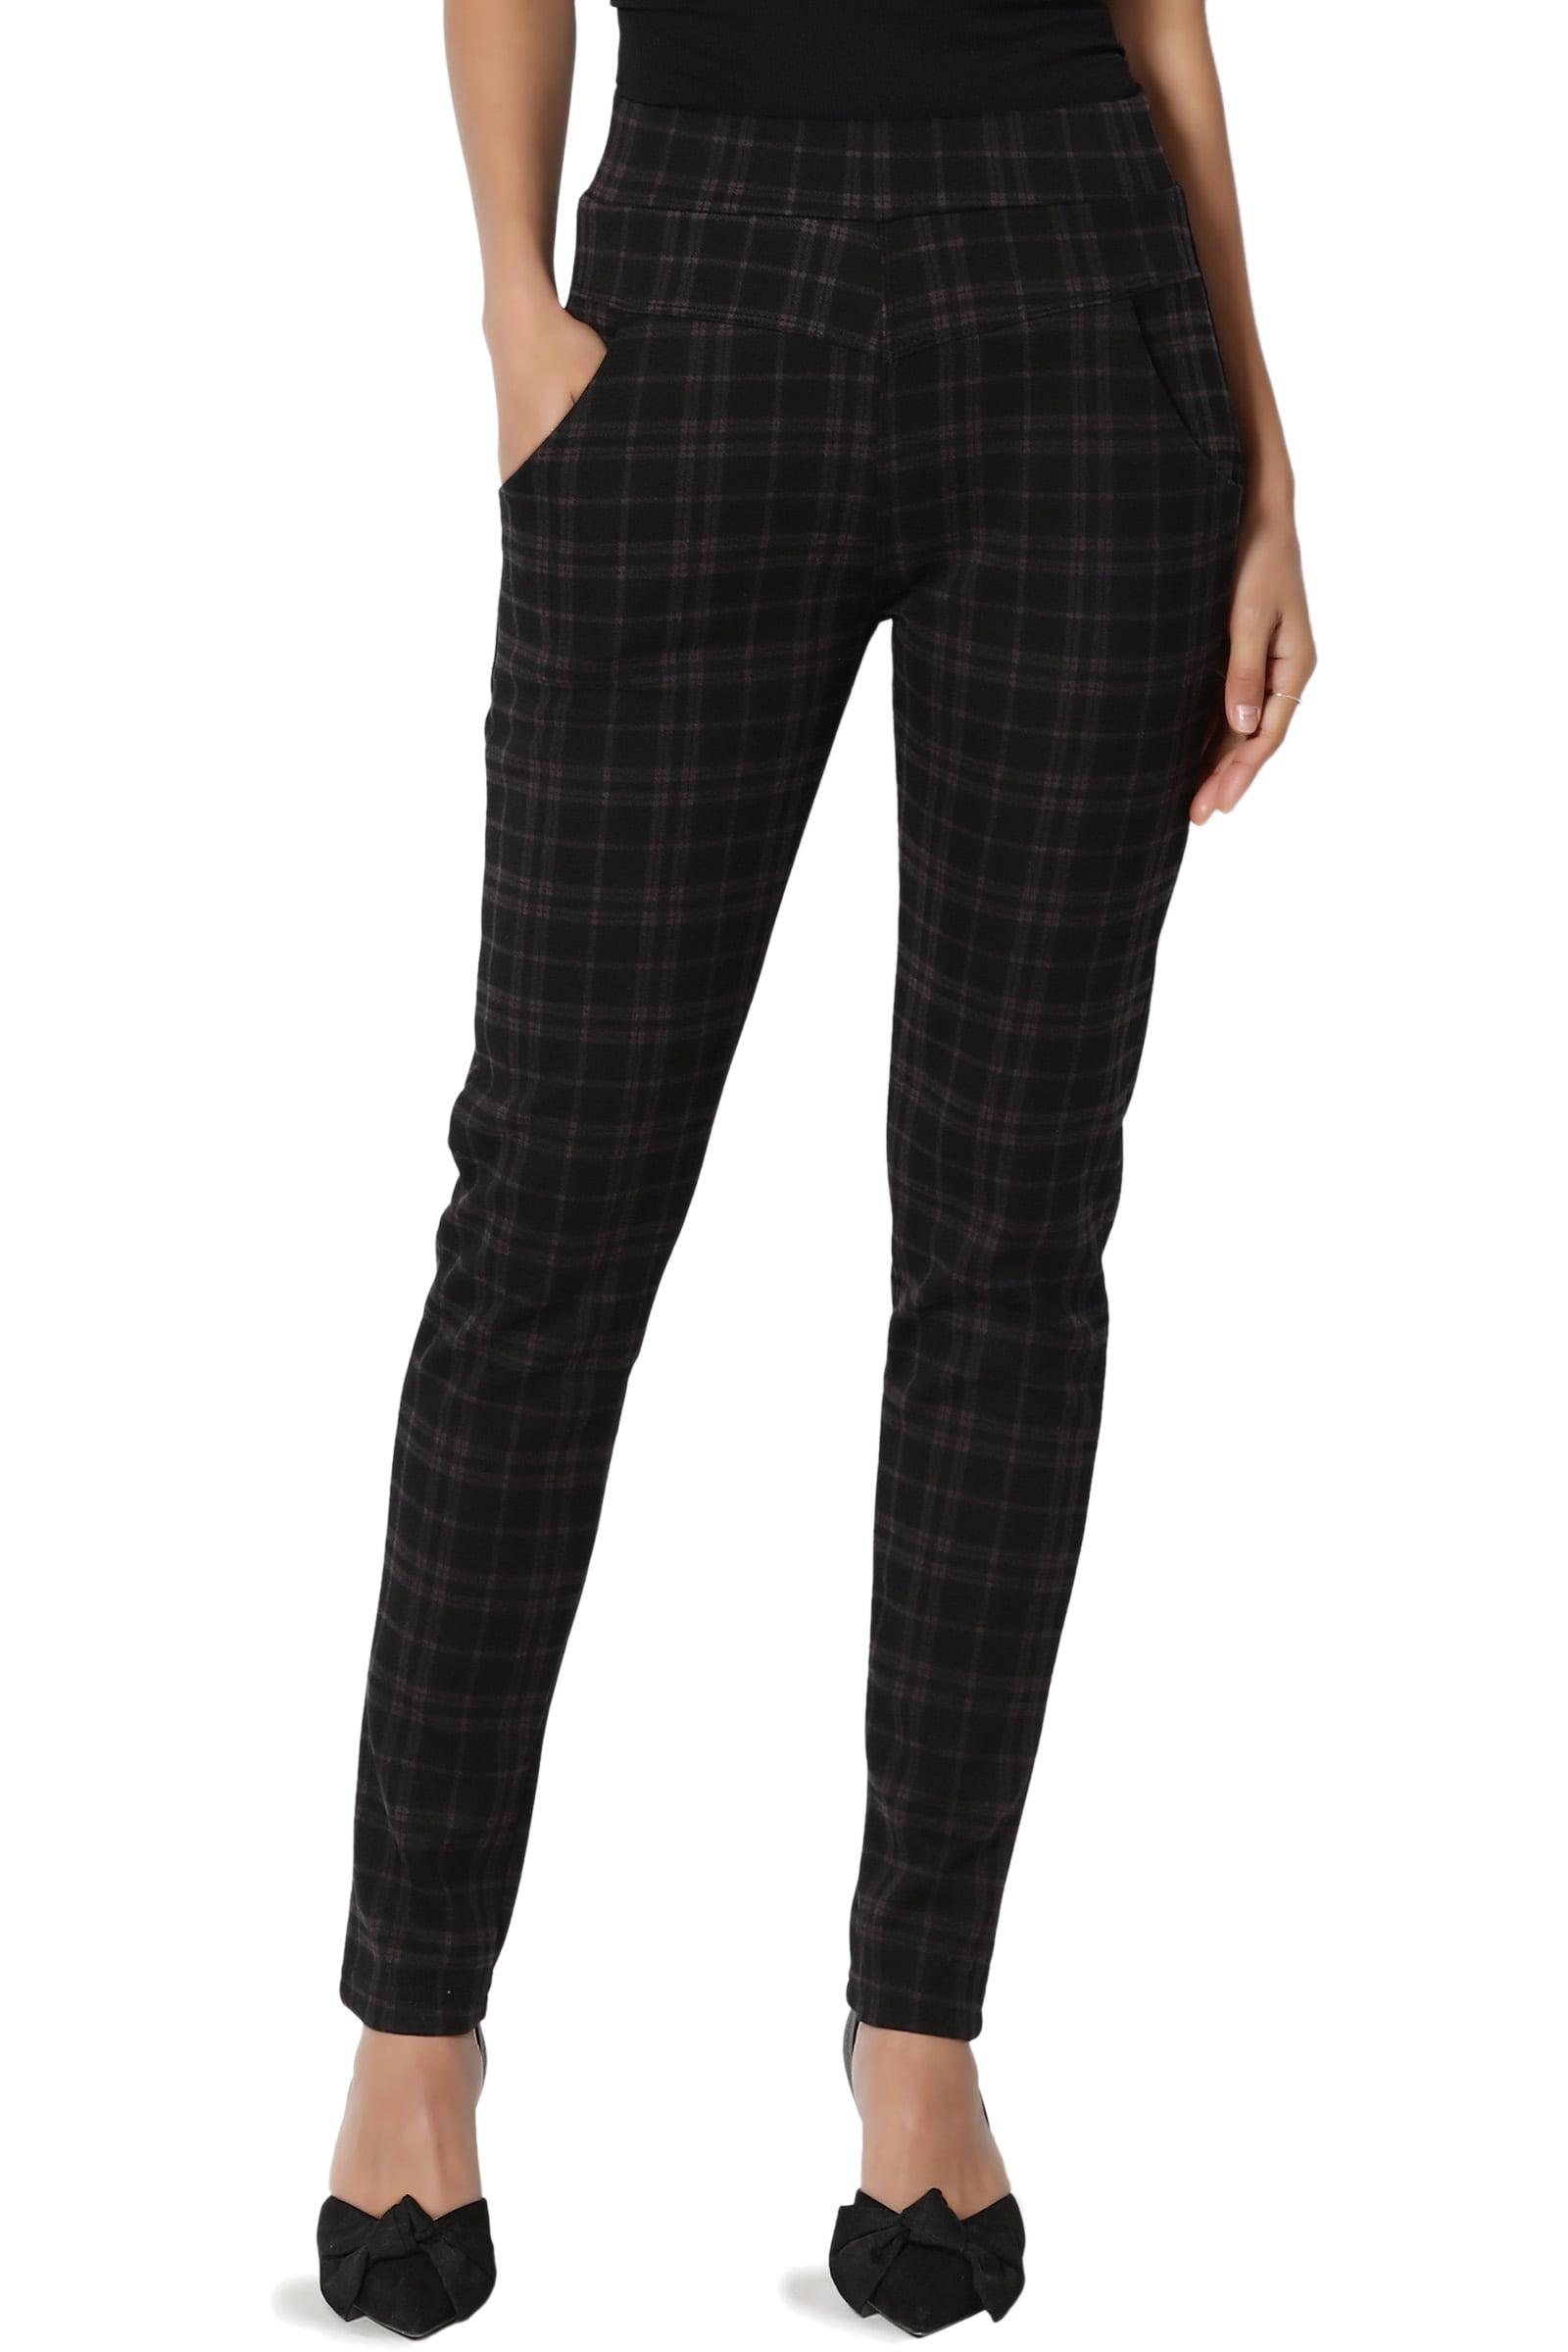 TheMogan Junior's Plaid Warm Knit Pull On High Waist Slim Leg Ankle Pants Trousers